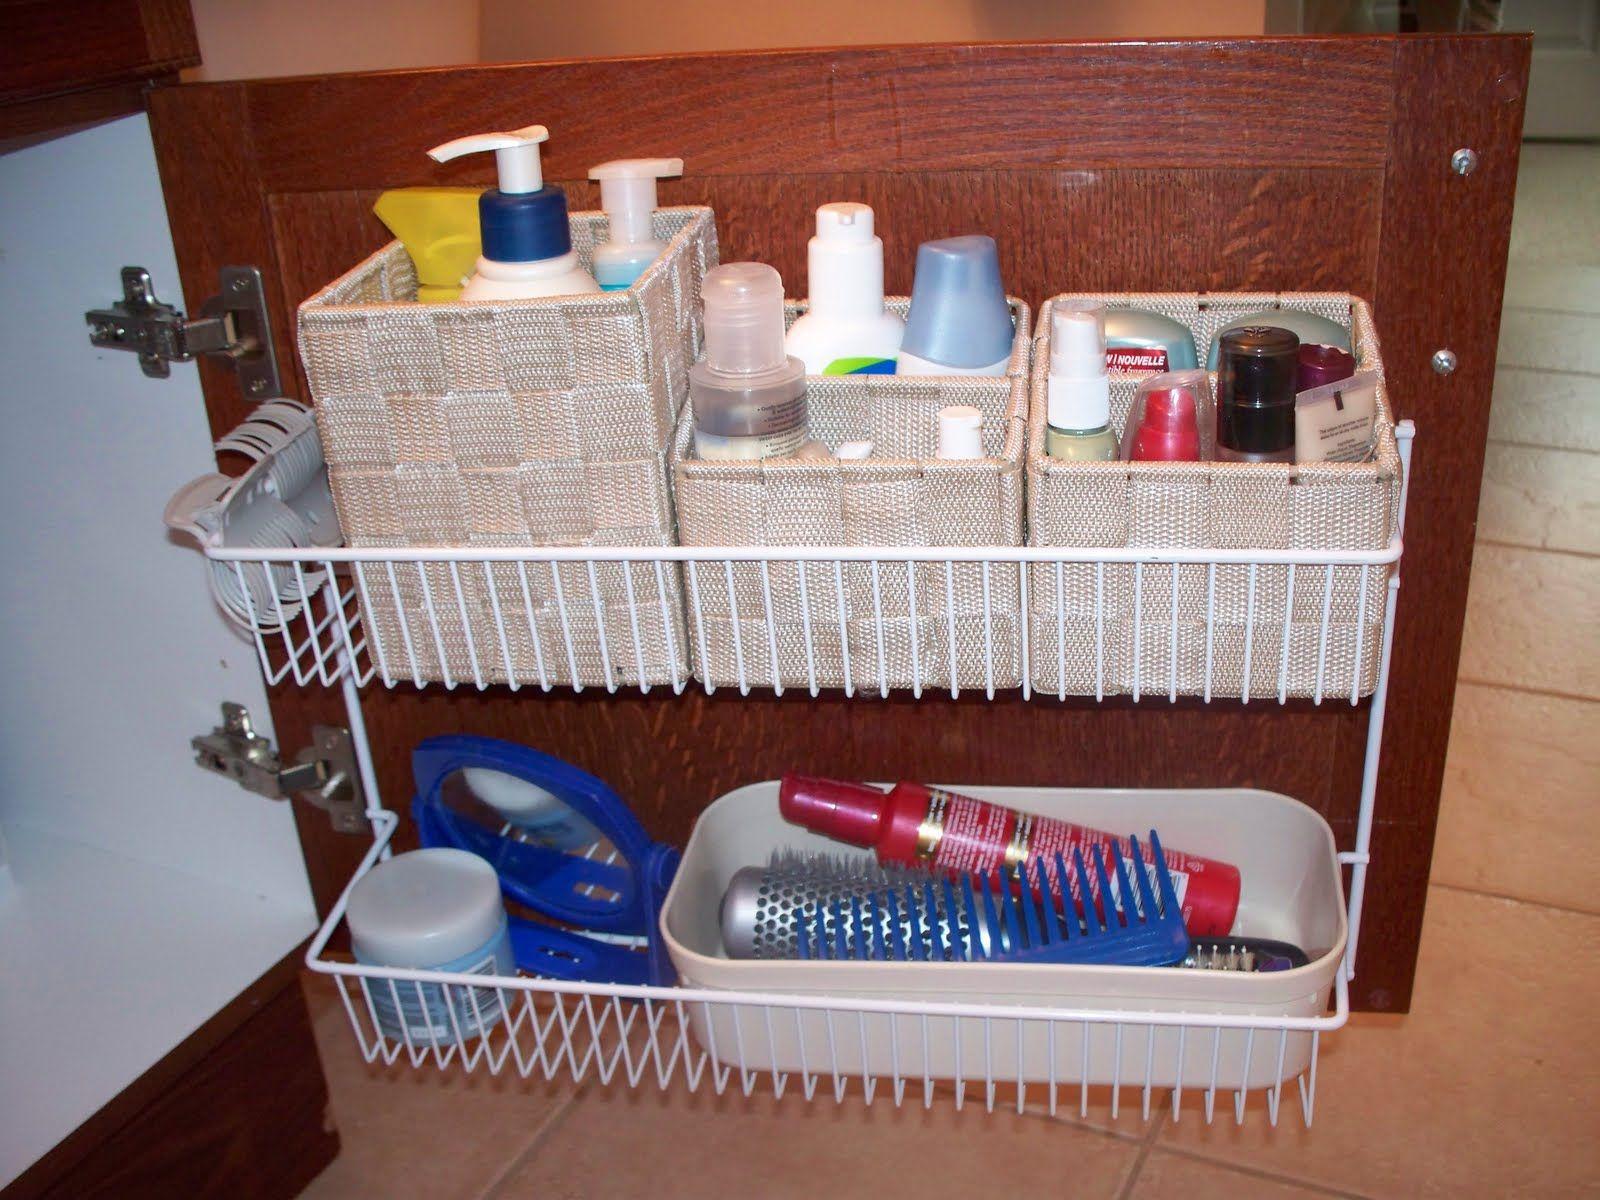 nice bathroom cabinet organizers bathroom storage on top new diy garage storage and organization ideas minimal budget garage make over id=90614